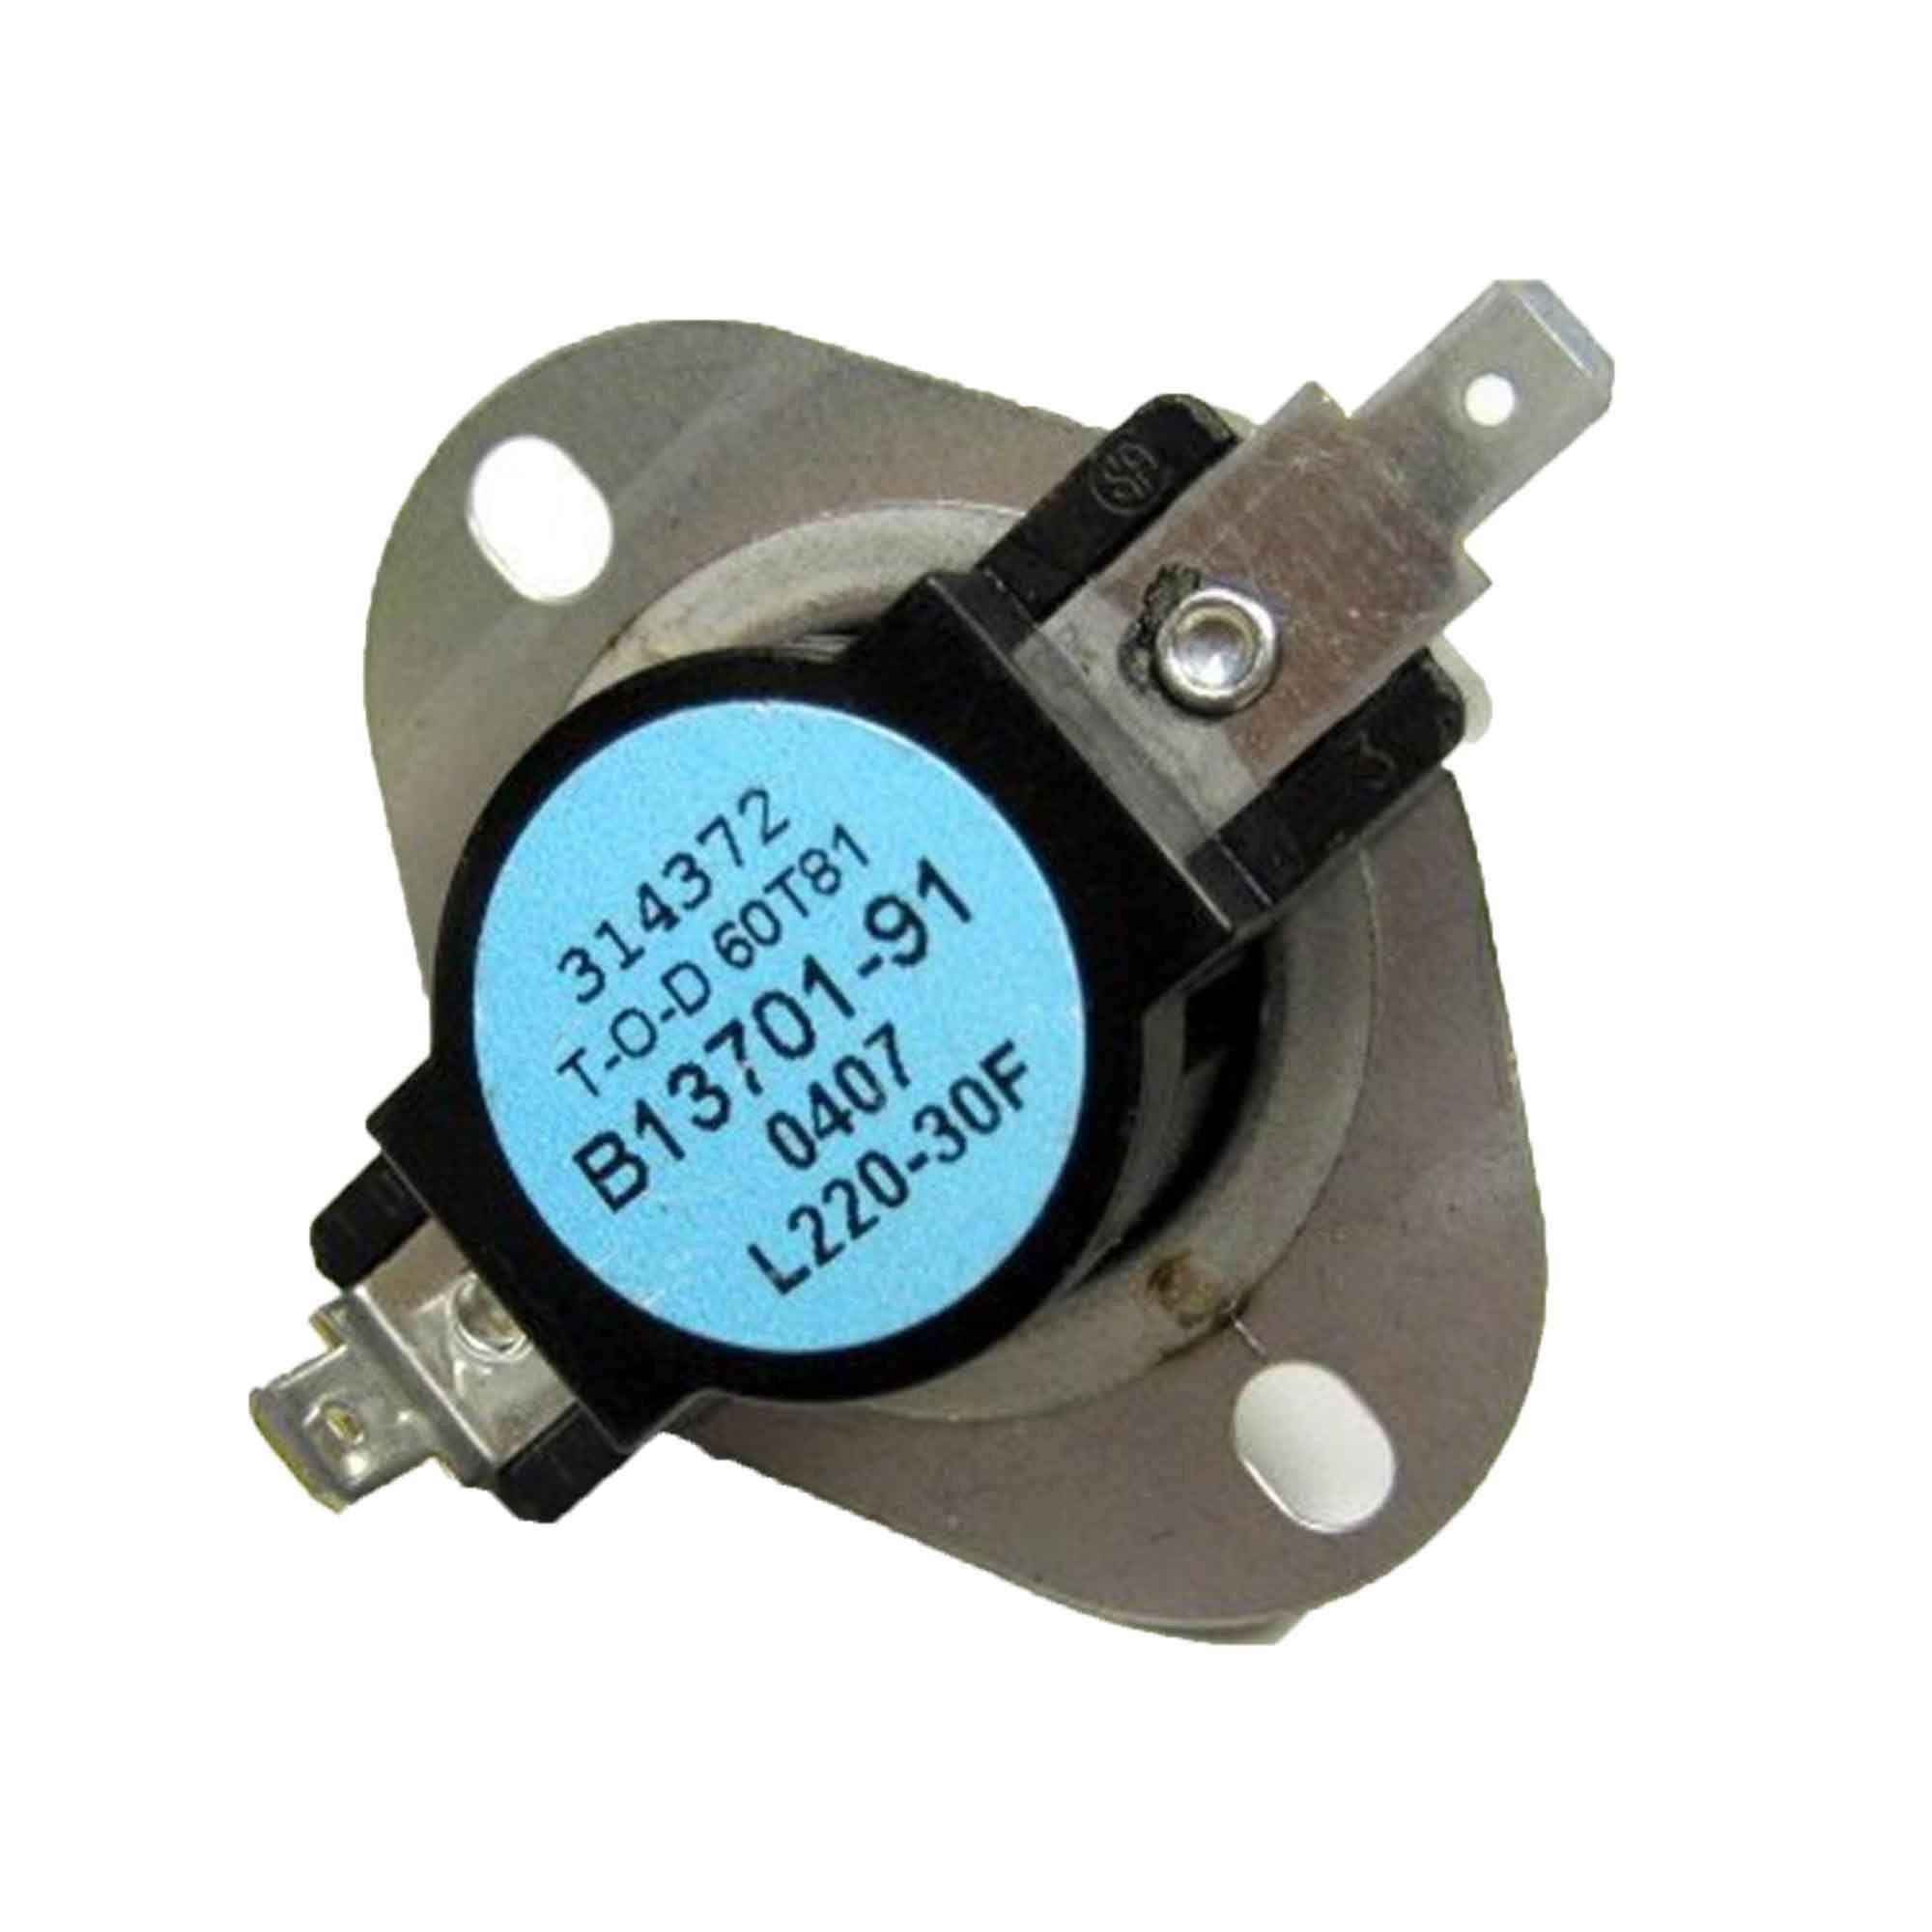 B1370191 Goodman Primary Limit Switch 220F